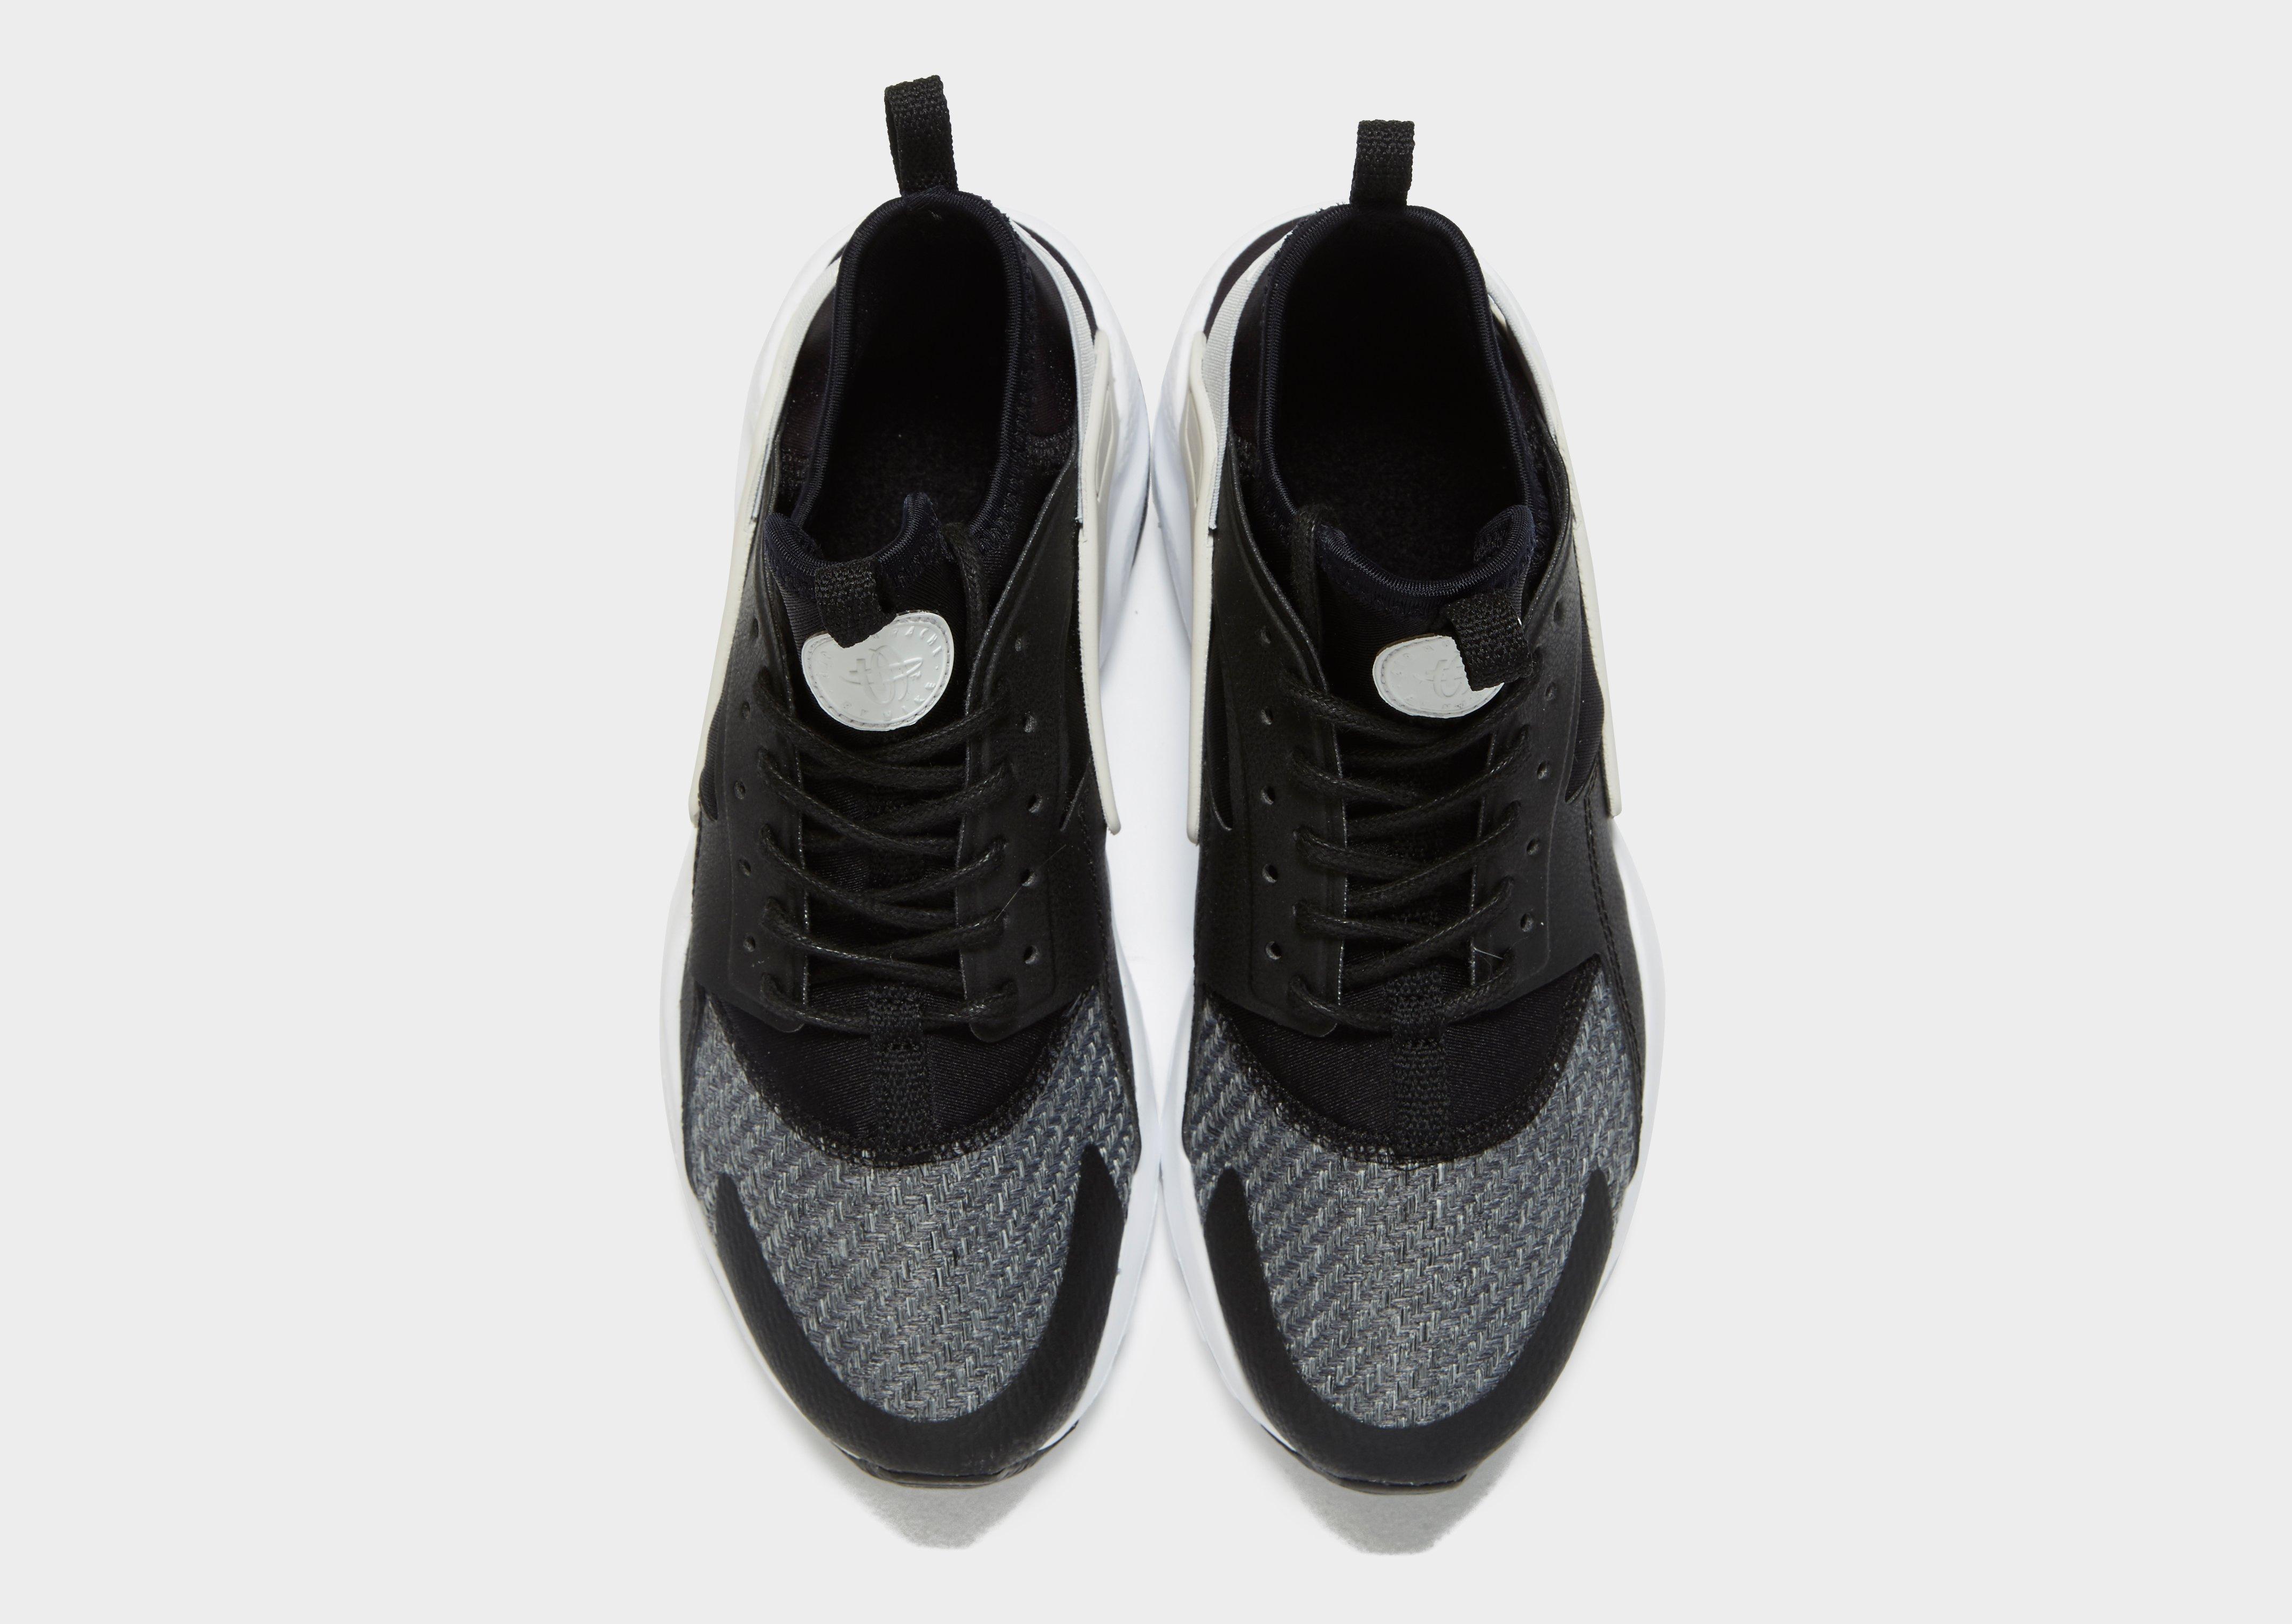 Custom Nike Air Max 95 Soccer Cleates  8daea018a